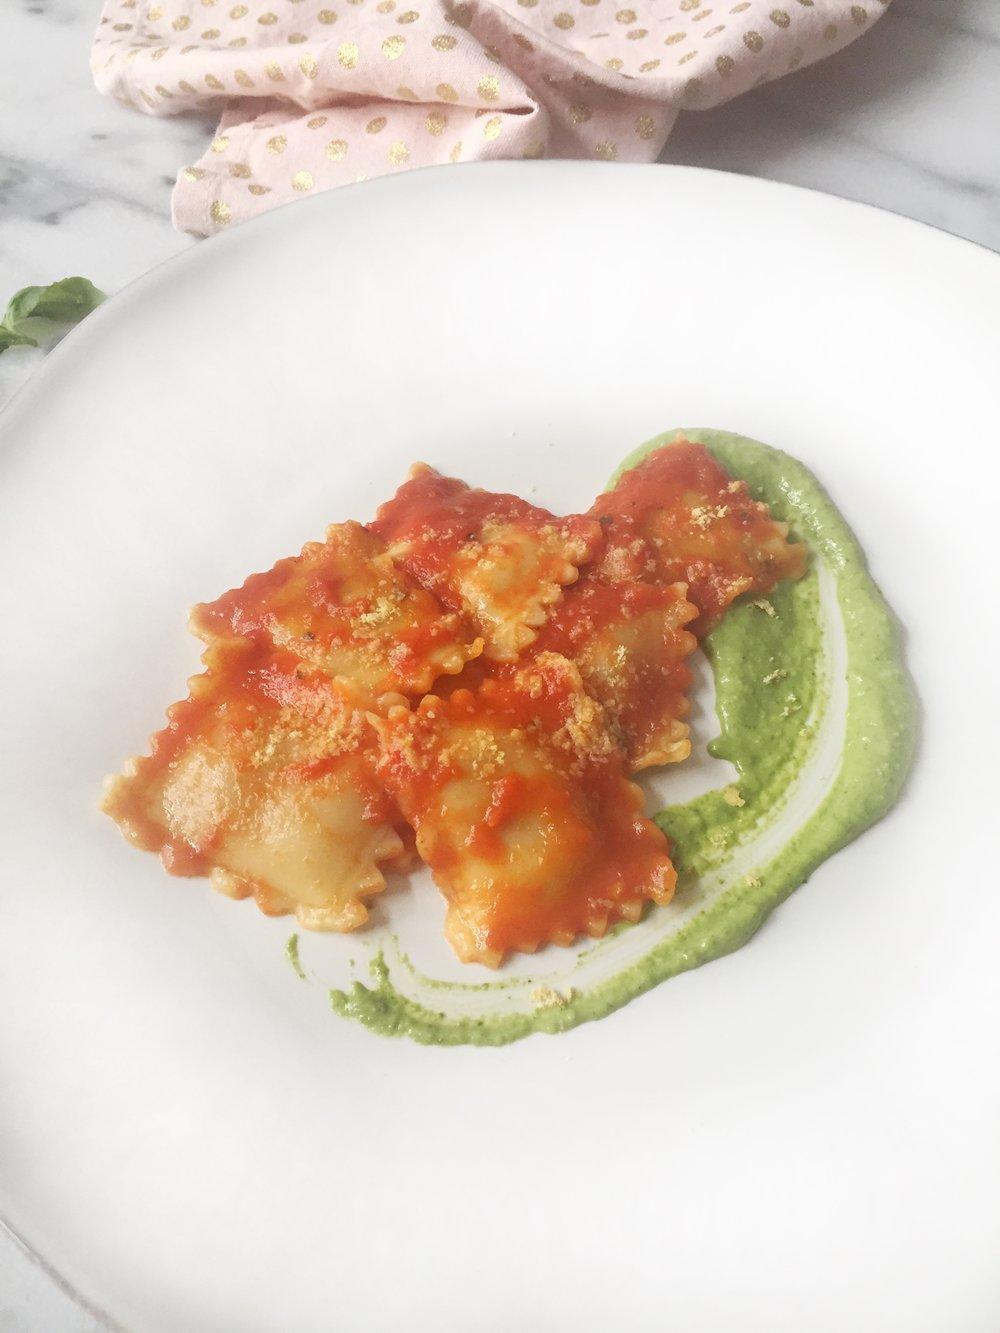 Butternut Squash Ravioli with Creamy Pesto